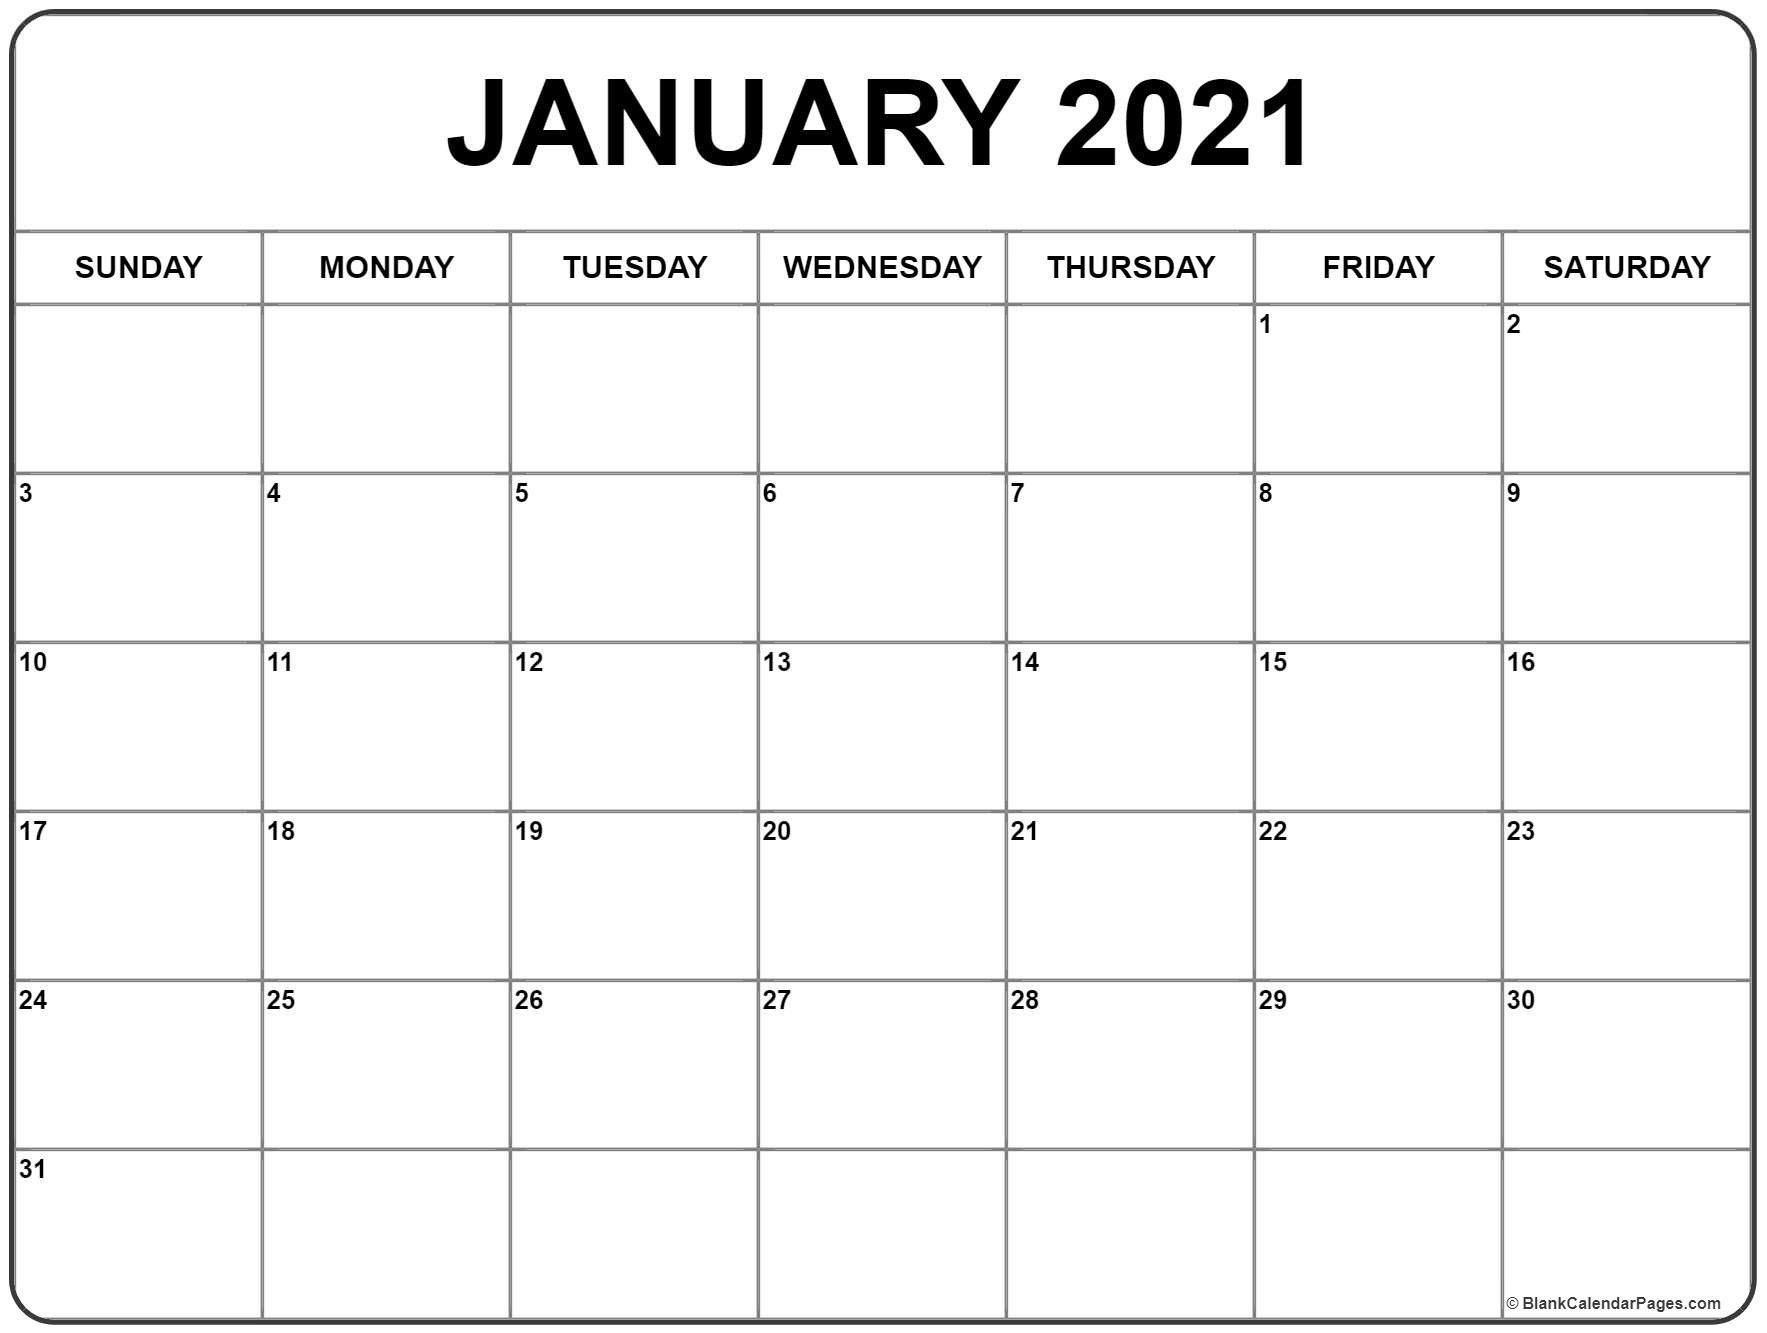 Calendar January 2021 Printable In 2020 | Print Calendar